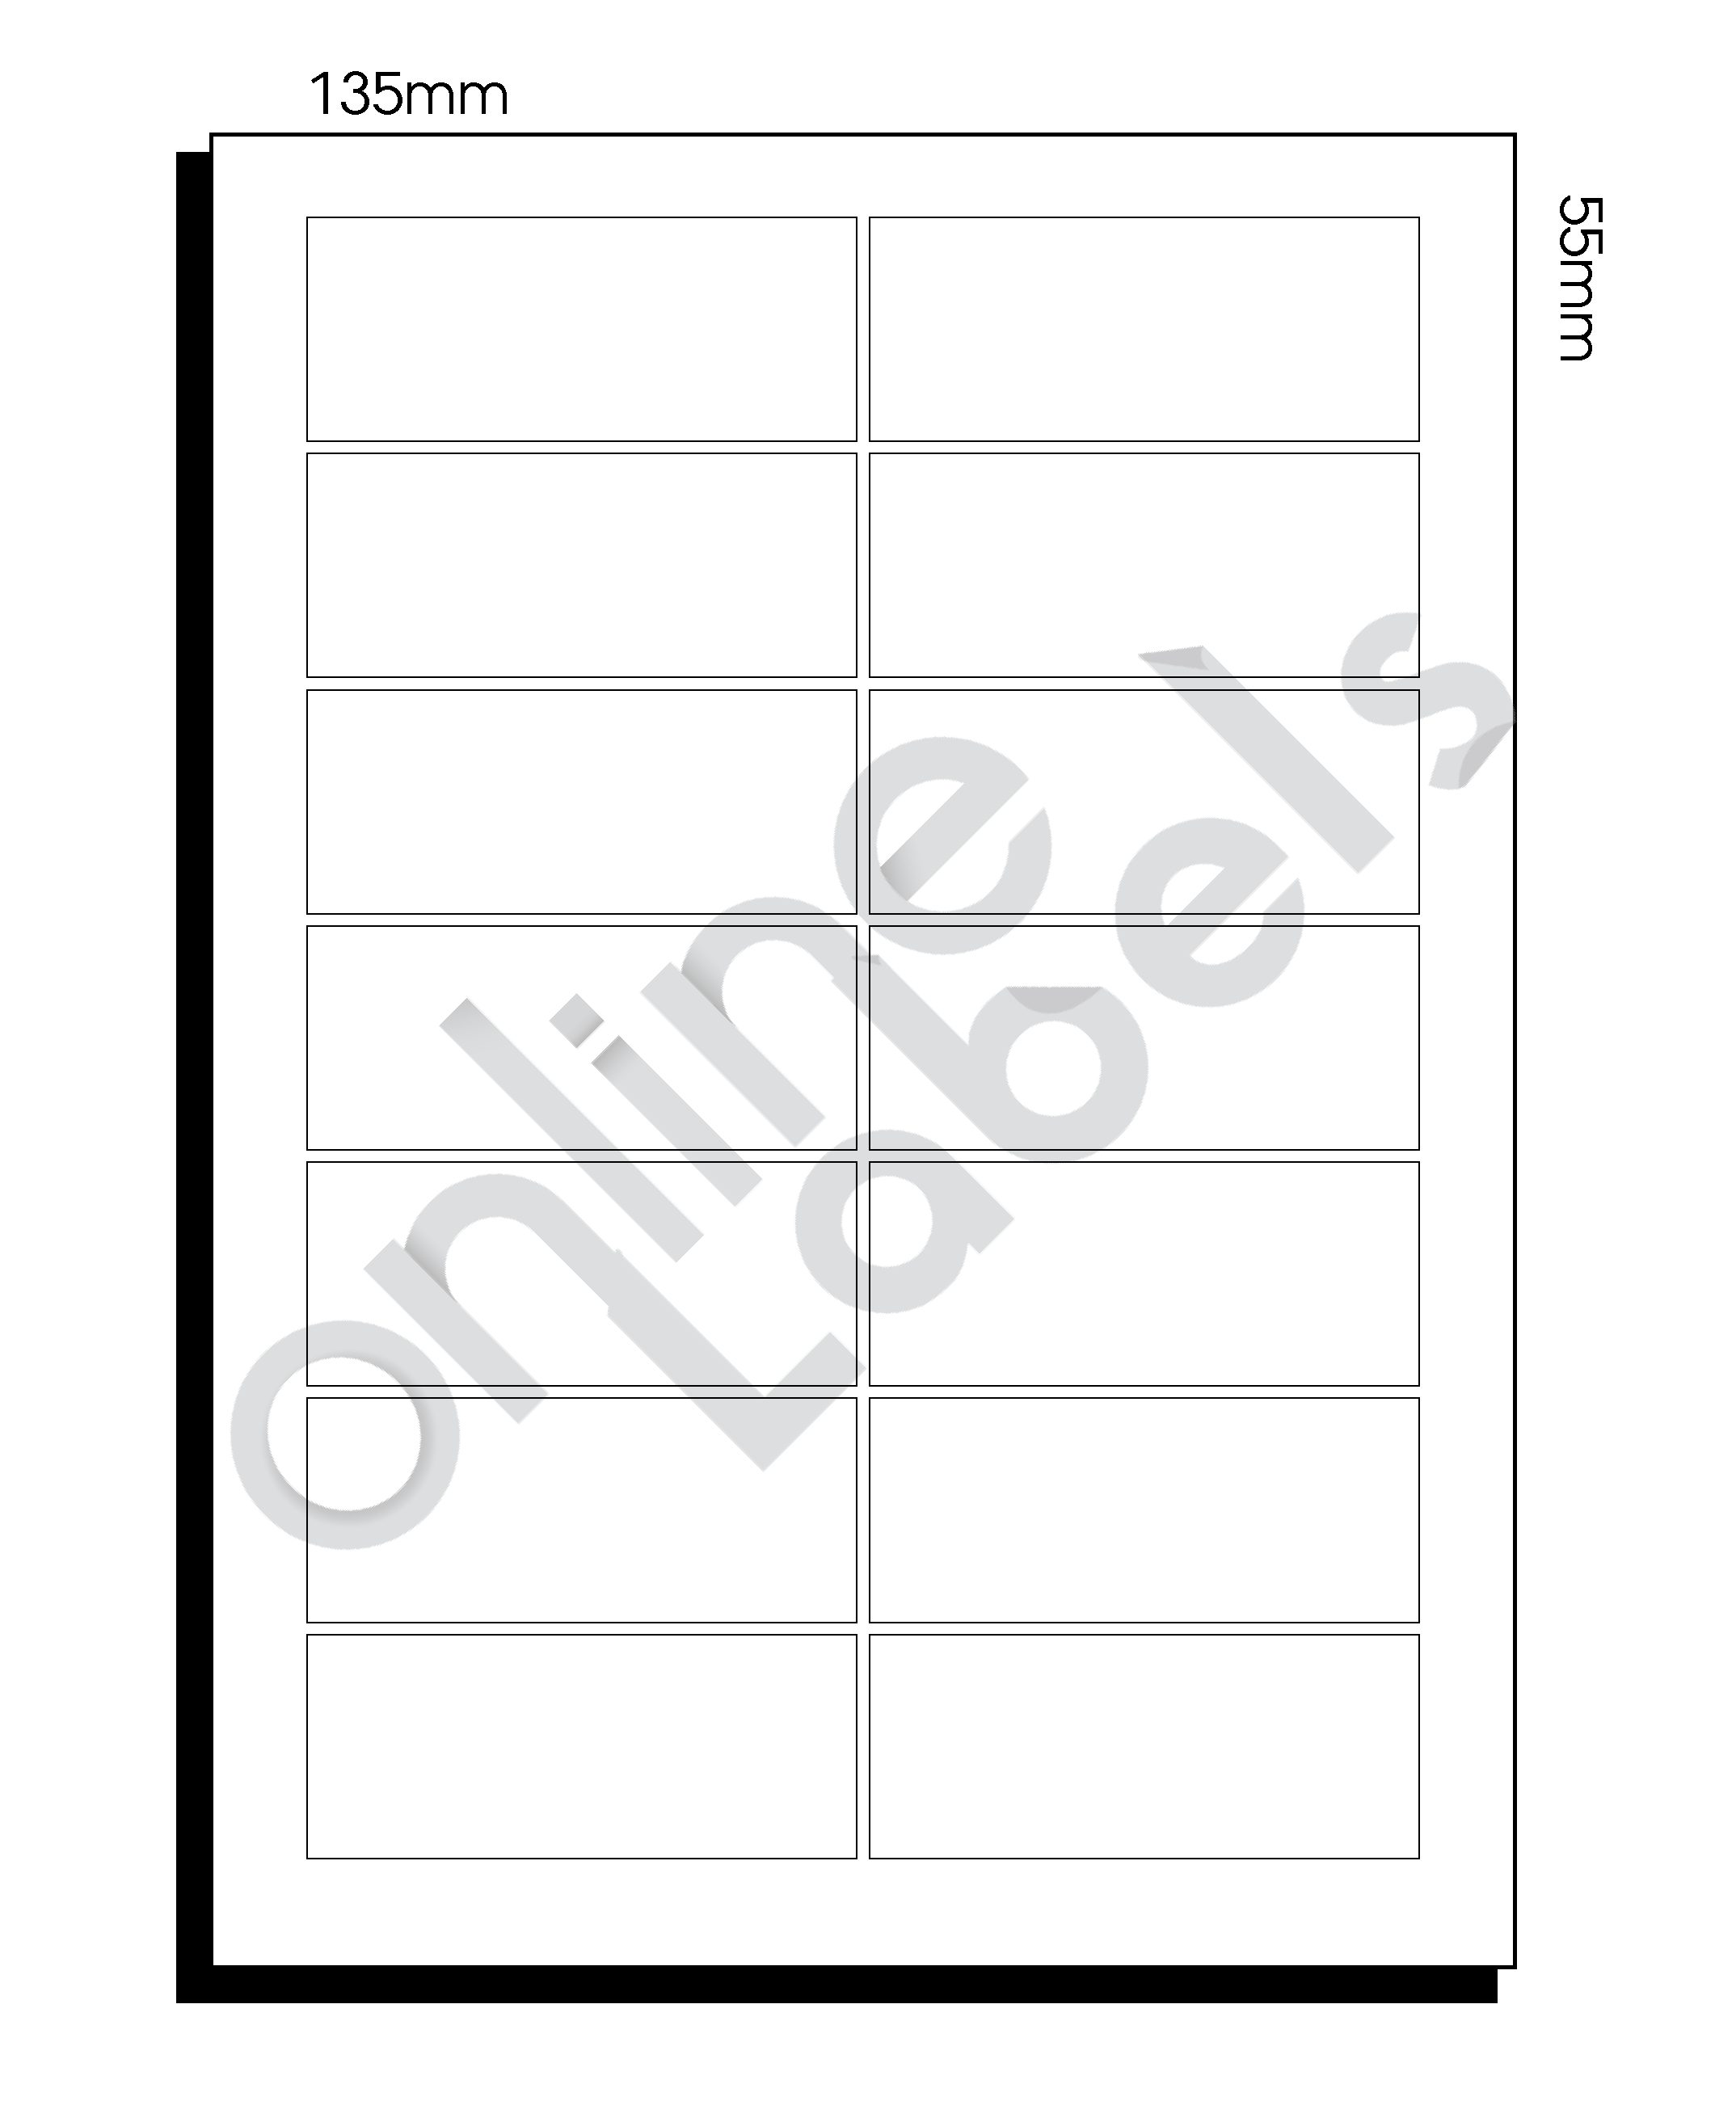 SR-A3 Diecut Labels – 135mm x 55mm